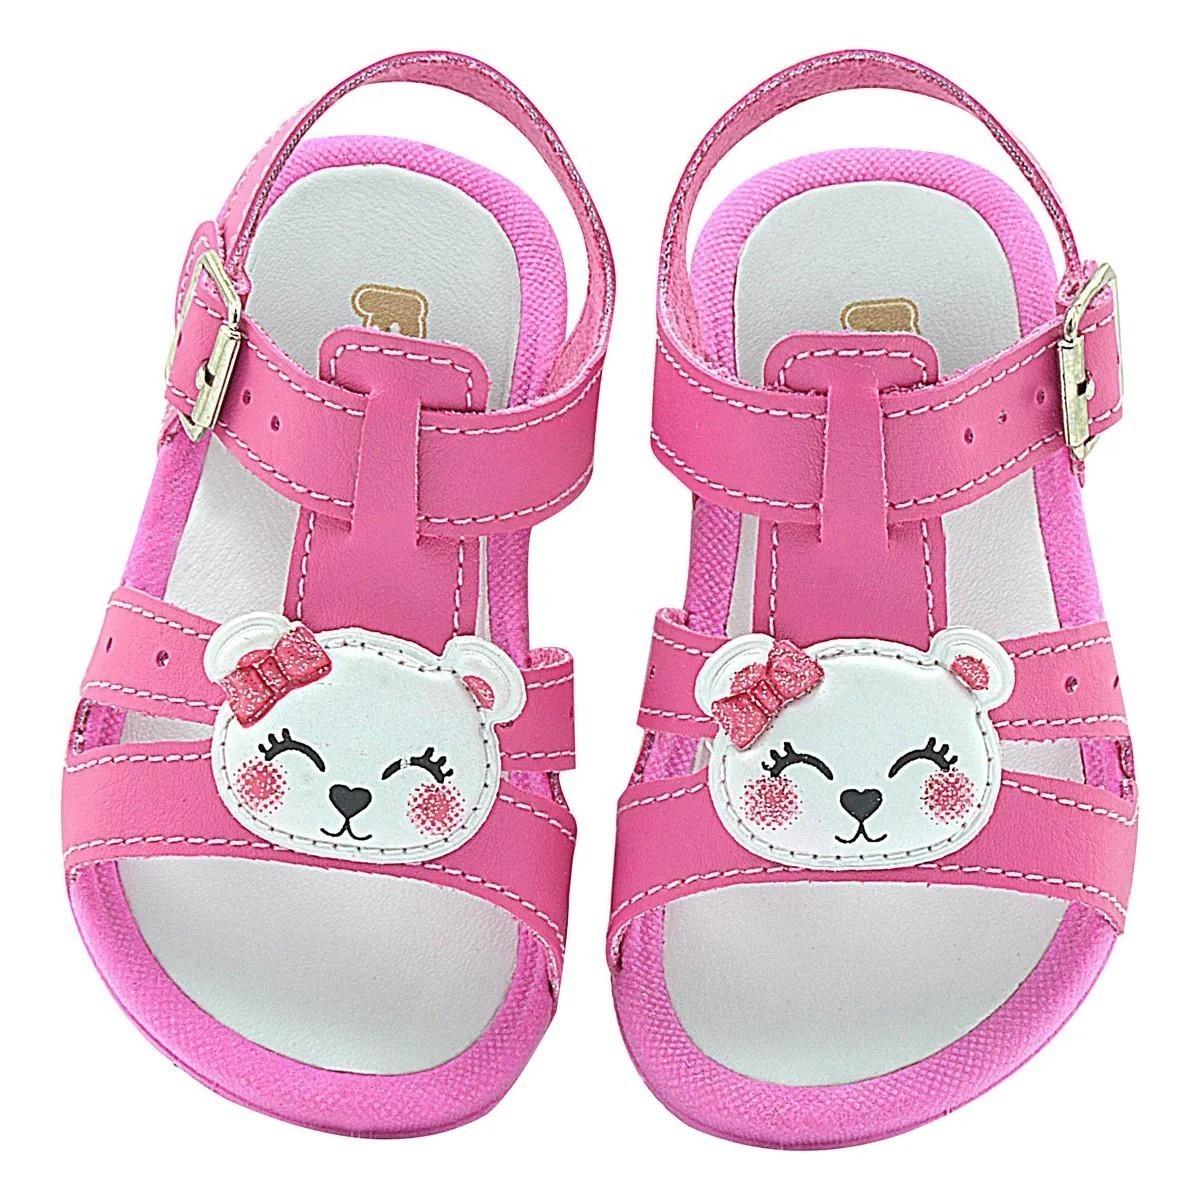 Papete Infantil Pé com Pé Ursinha Pink Fivela Menina Bebê